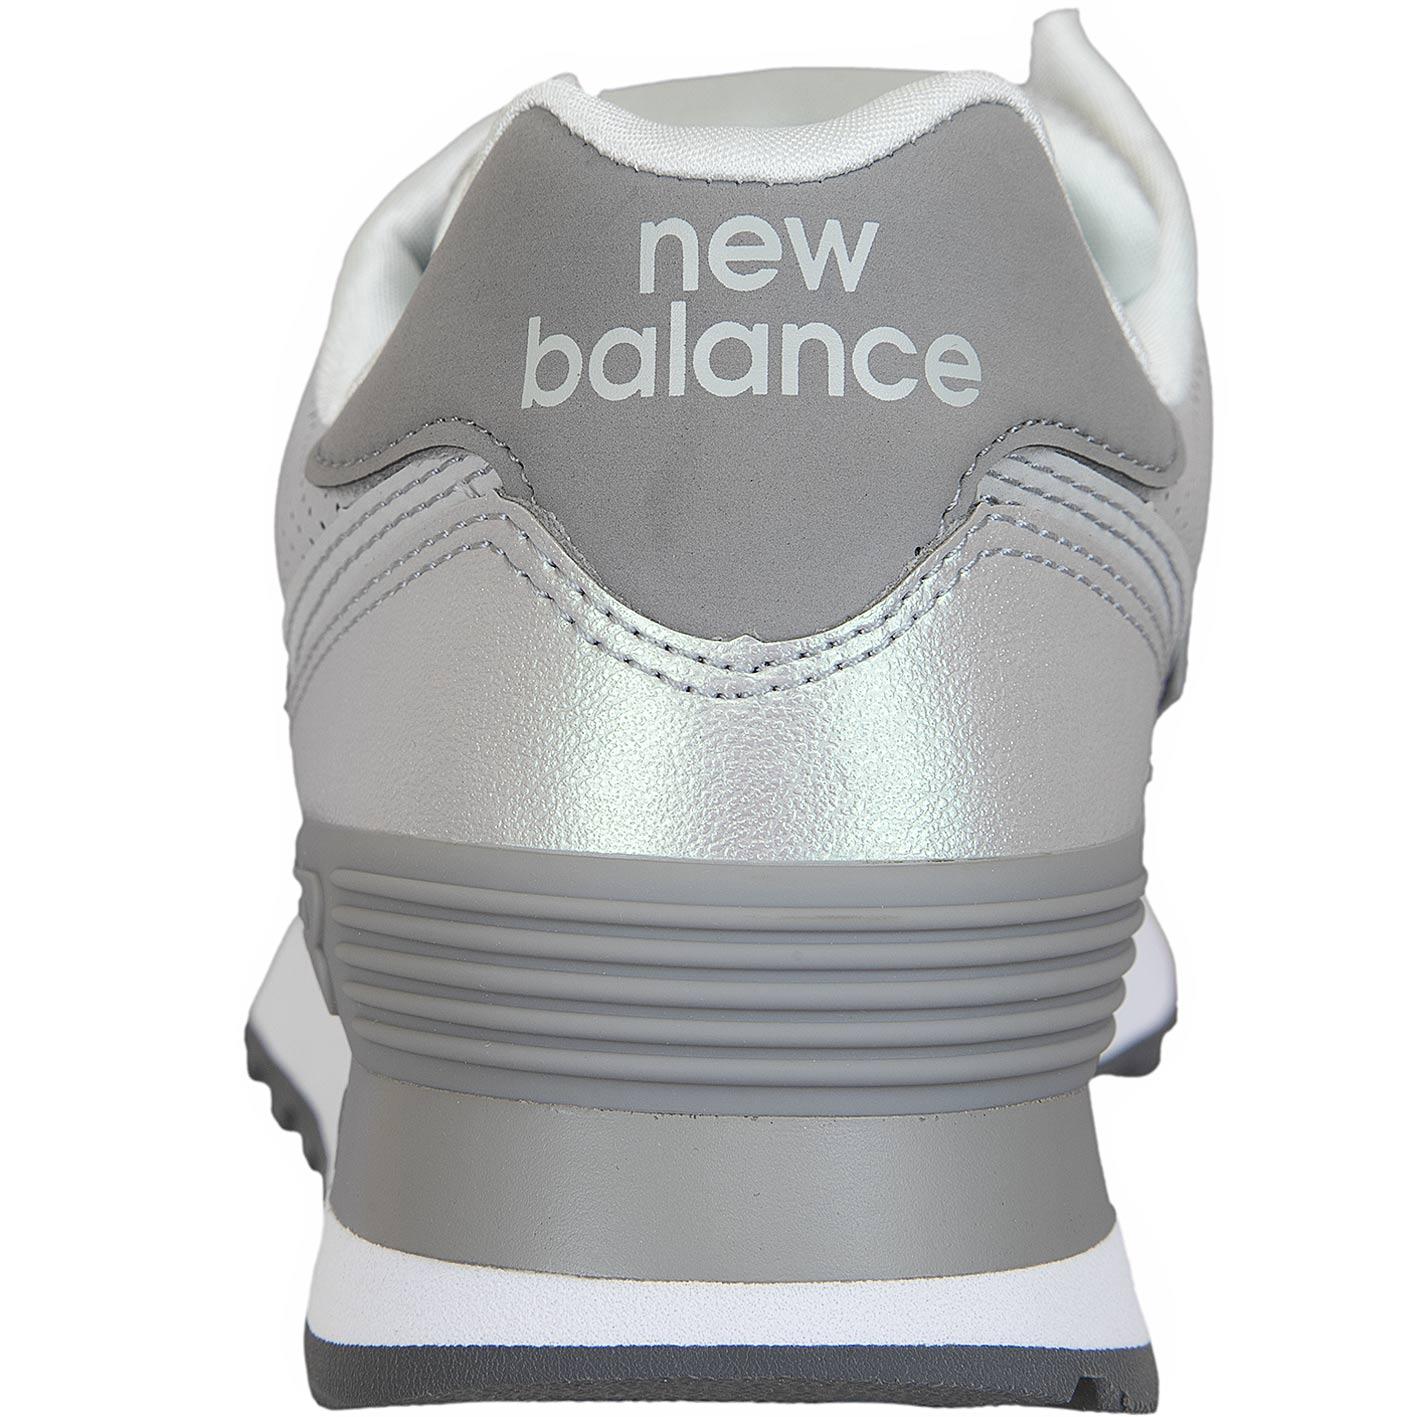 new balance damen 996 grau silber